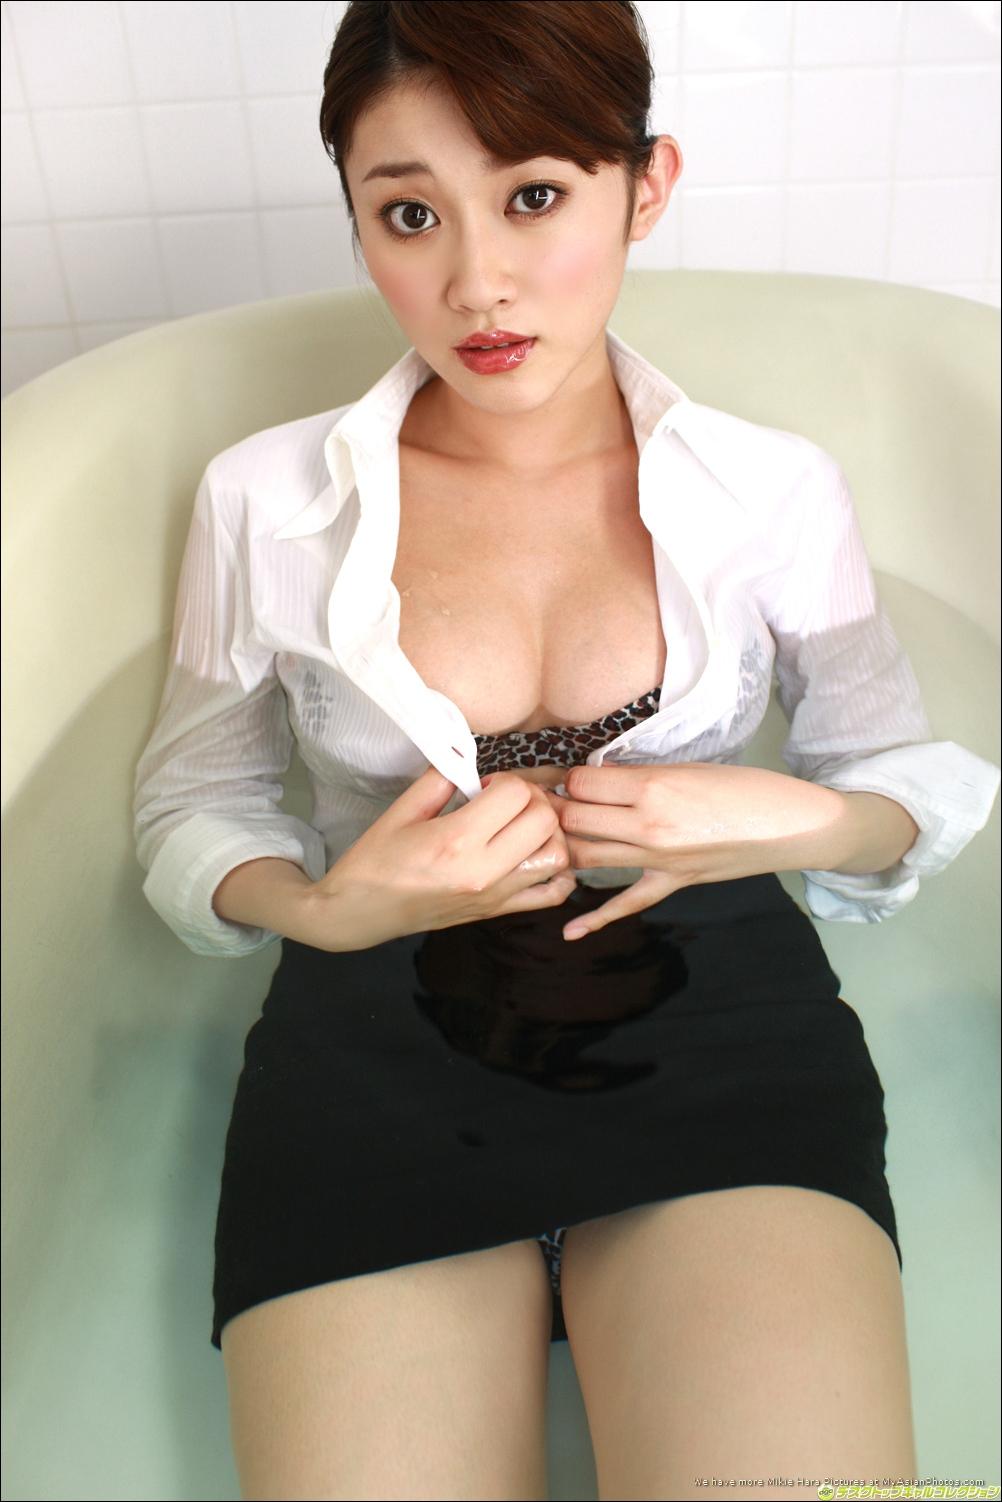 Mikie Hara undress sexy uniform - Japanese actress ~ JAV Photo- Sexy Girl